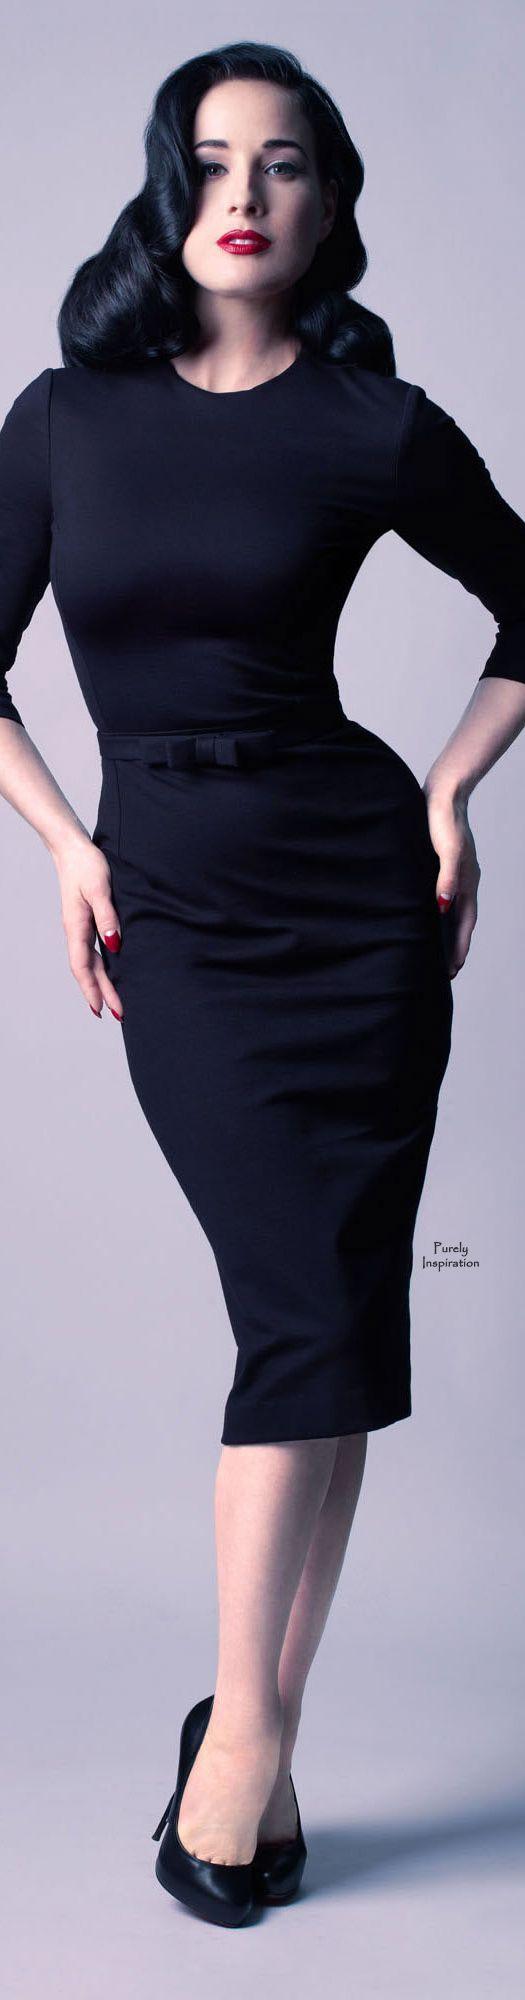 Pin Up Fashion Style & Rockabilly Clothing | Punkabilly Blog